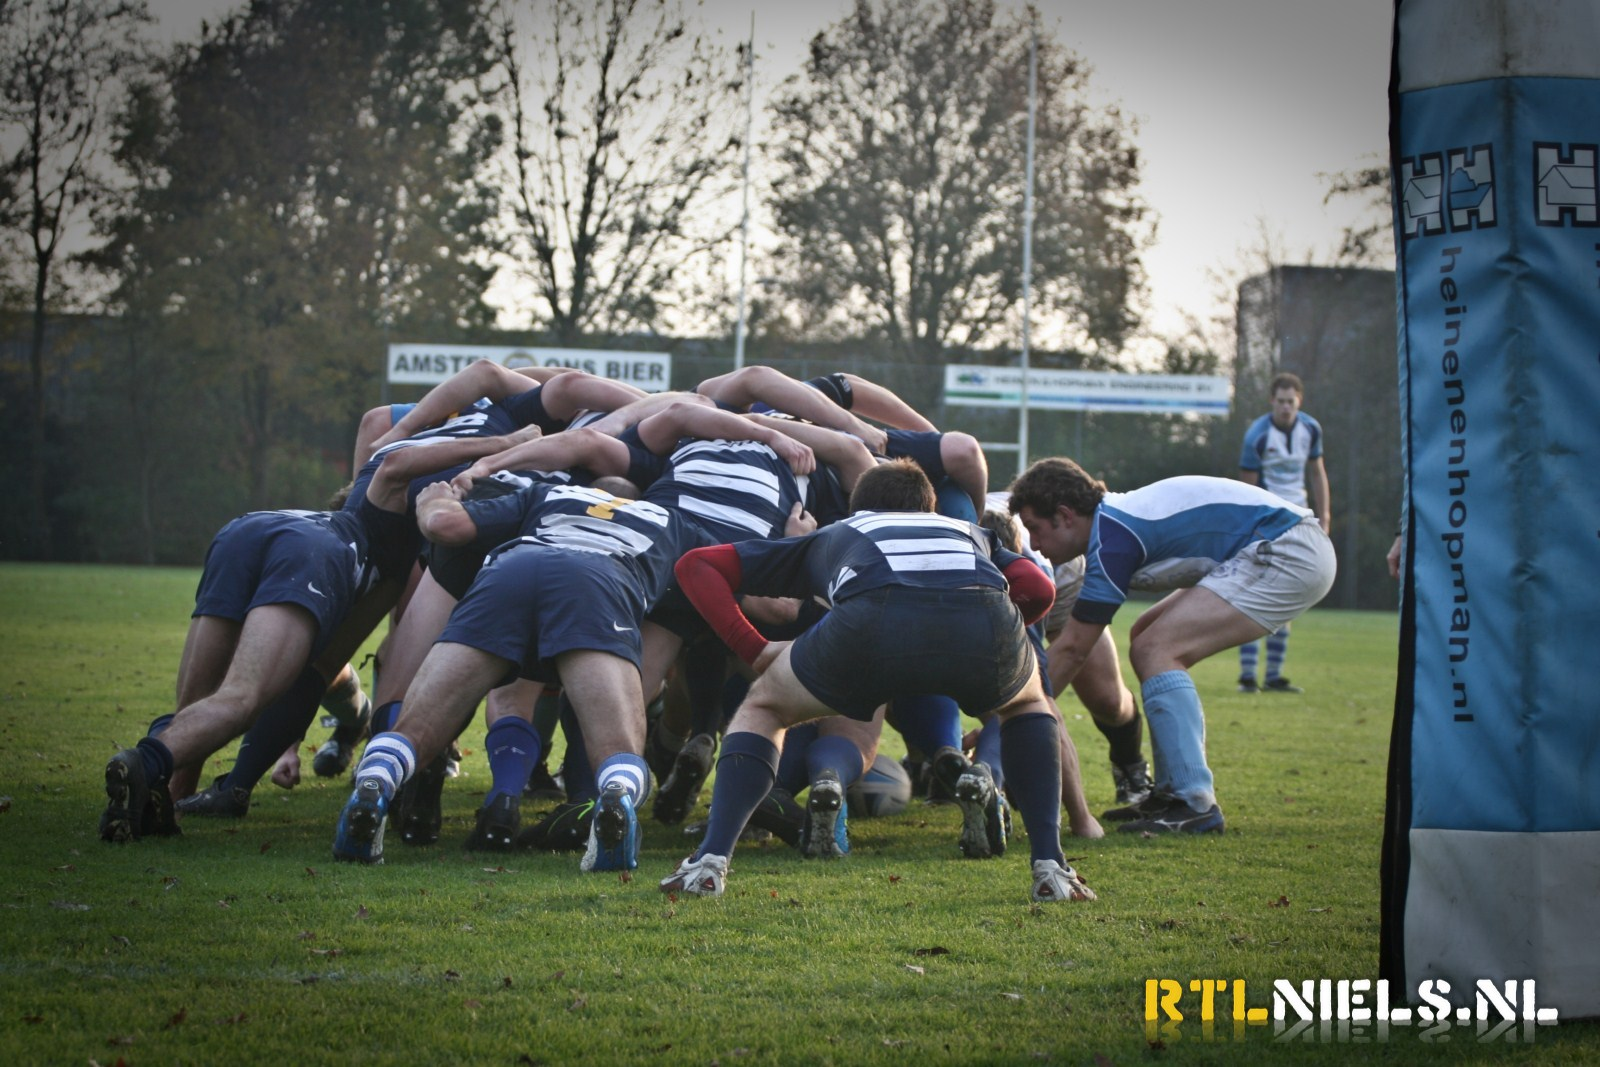 2011-11-19 | RCS – Hilversum 2 | 26-5